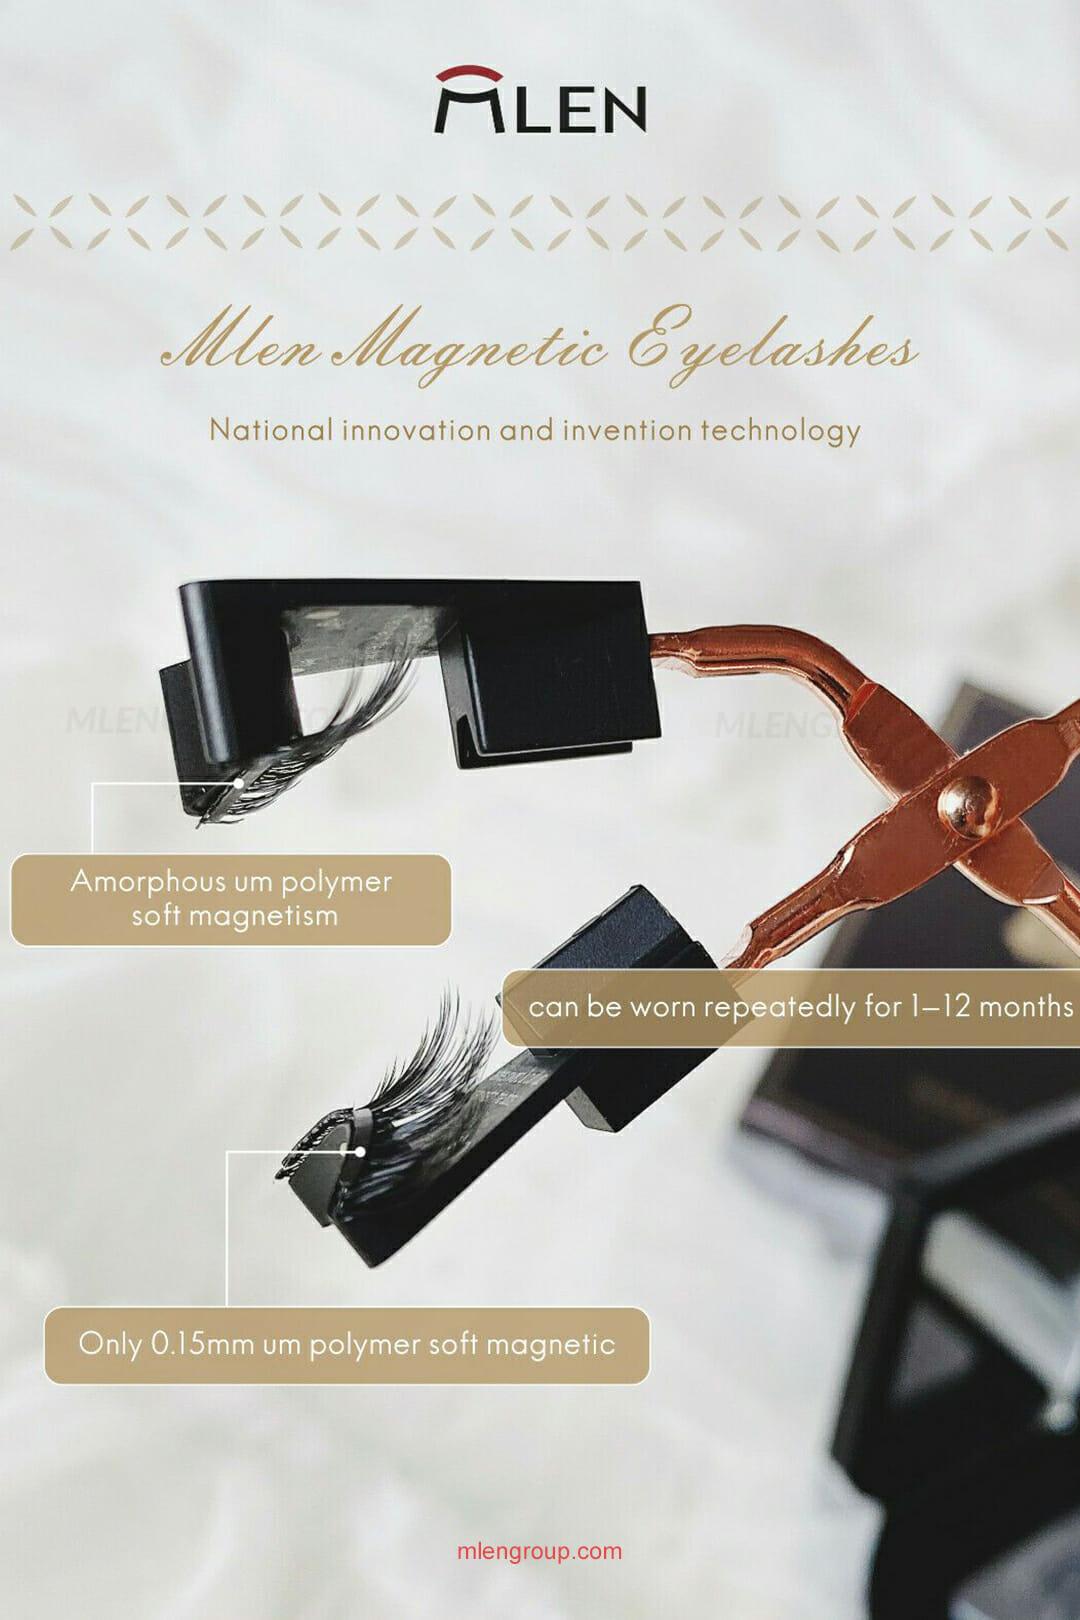 mlen group mlen magnetic eyelashes benefits 2